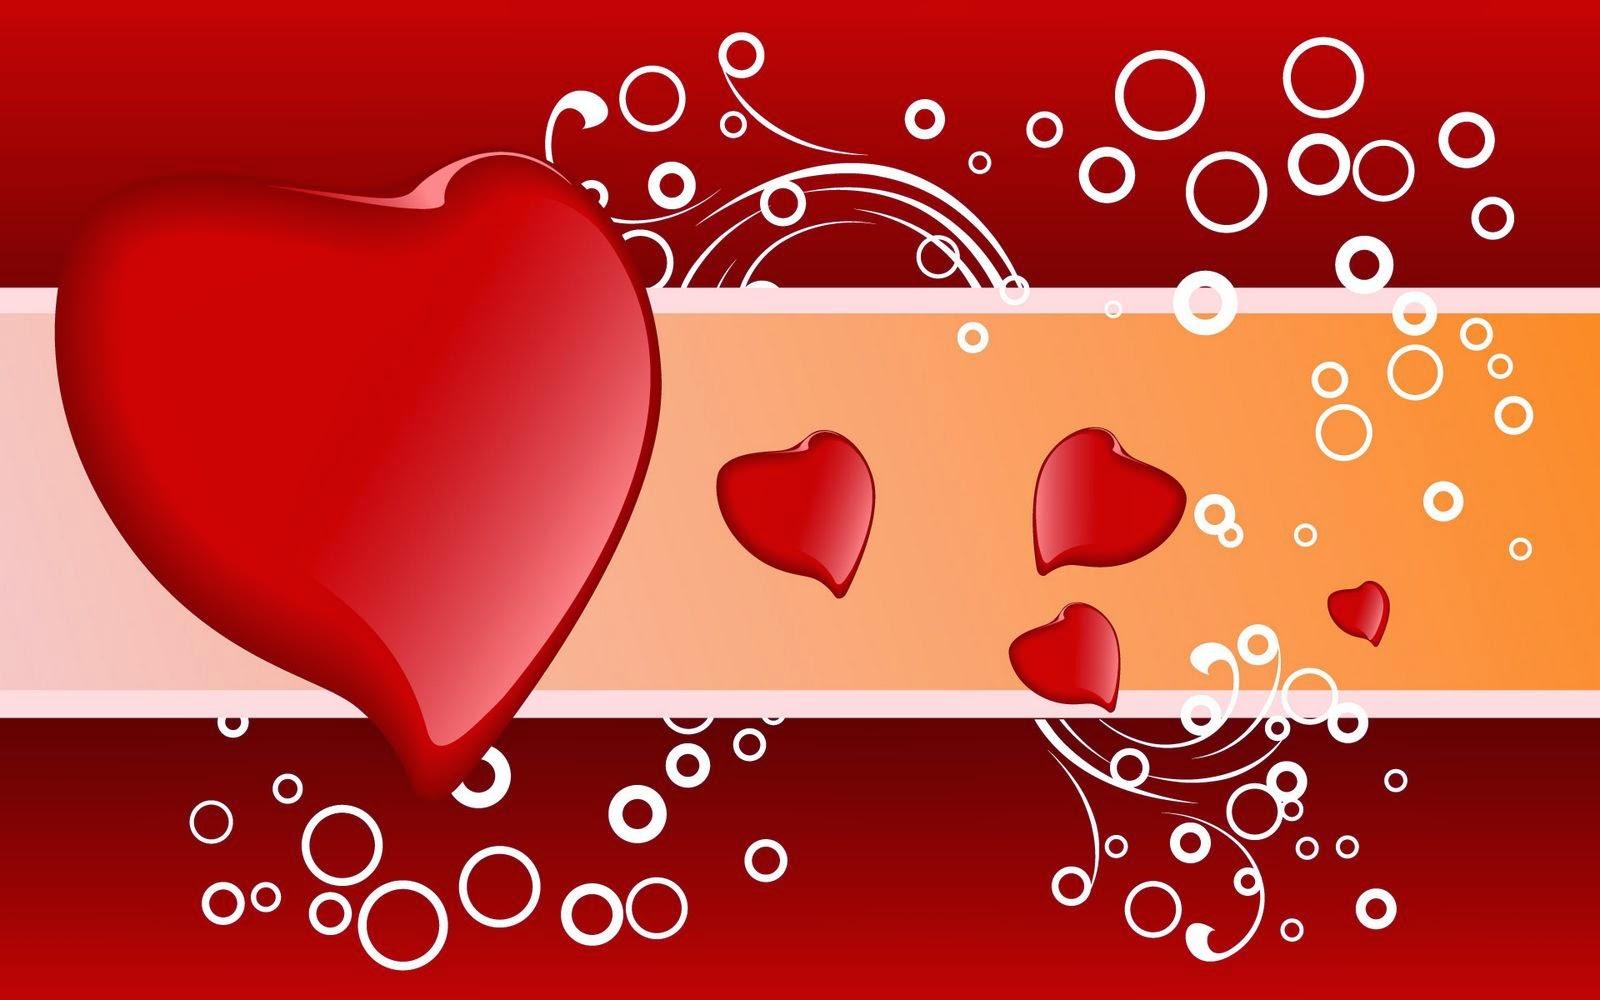 Saint-Valentines-Day-Red-hearts-on-Valentine-Day-0